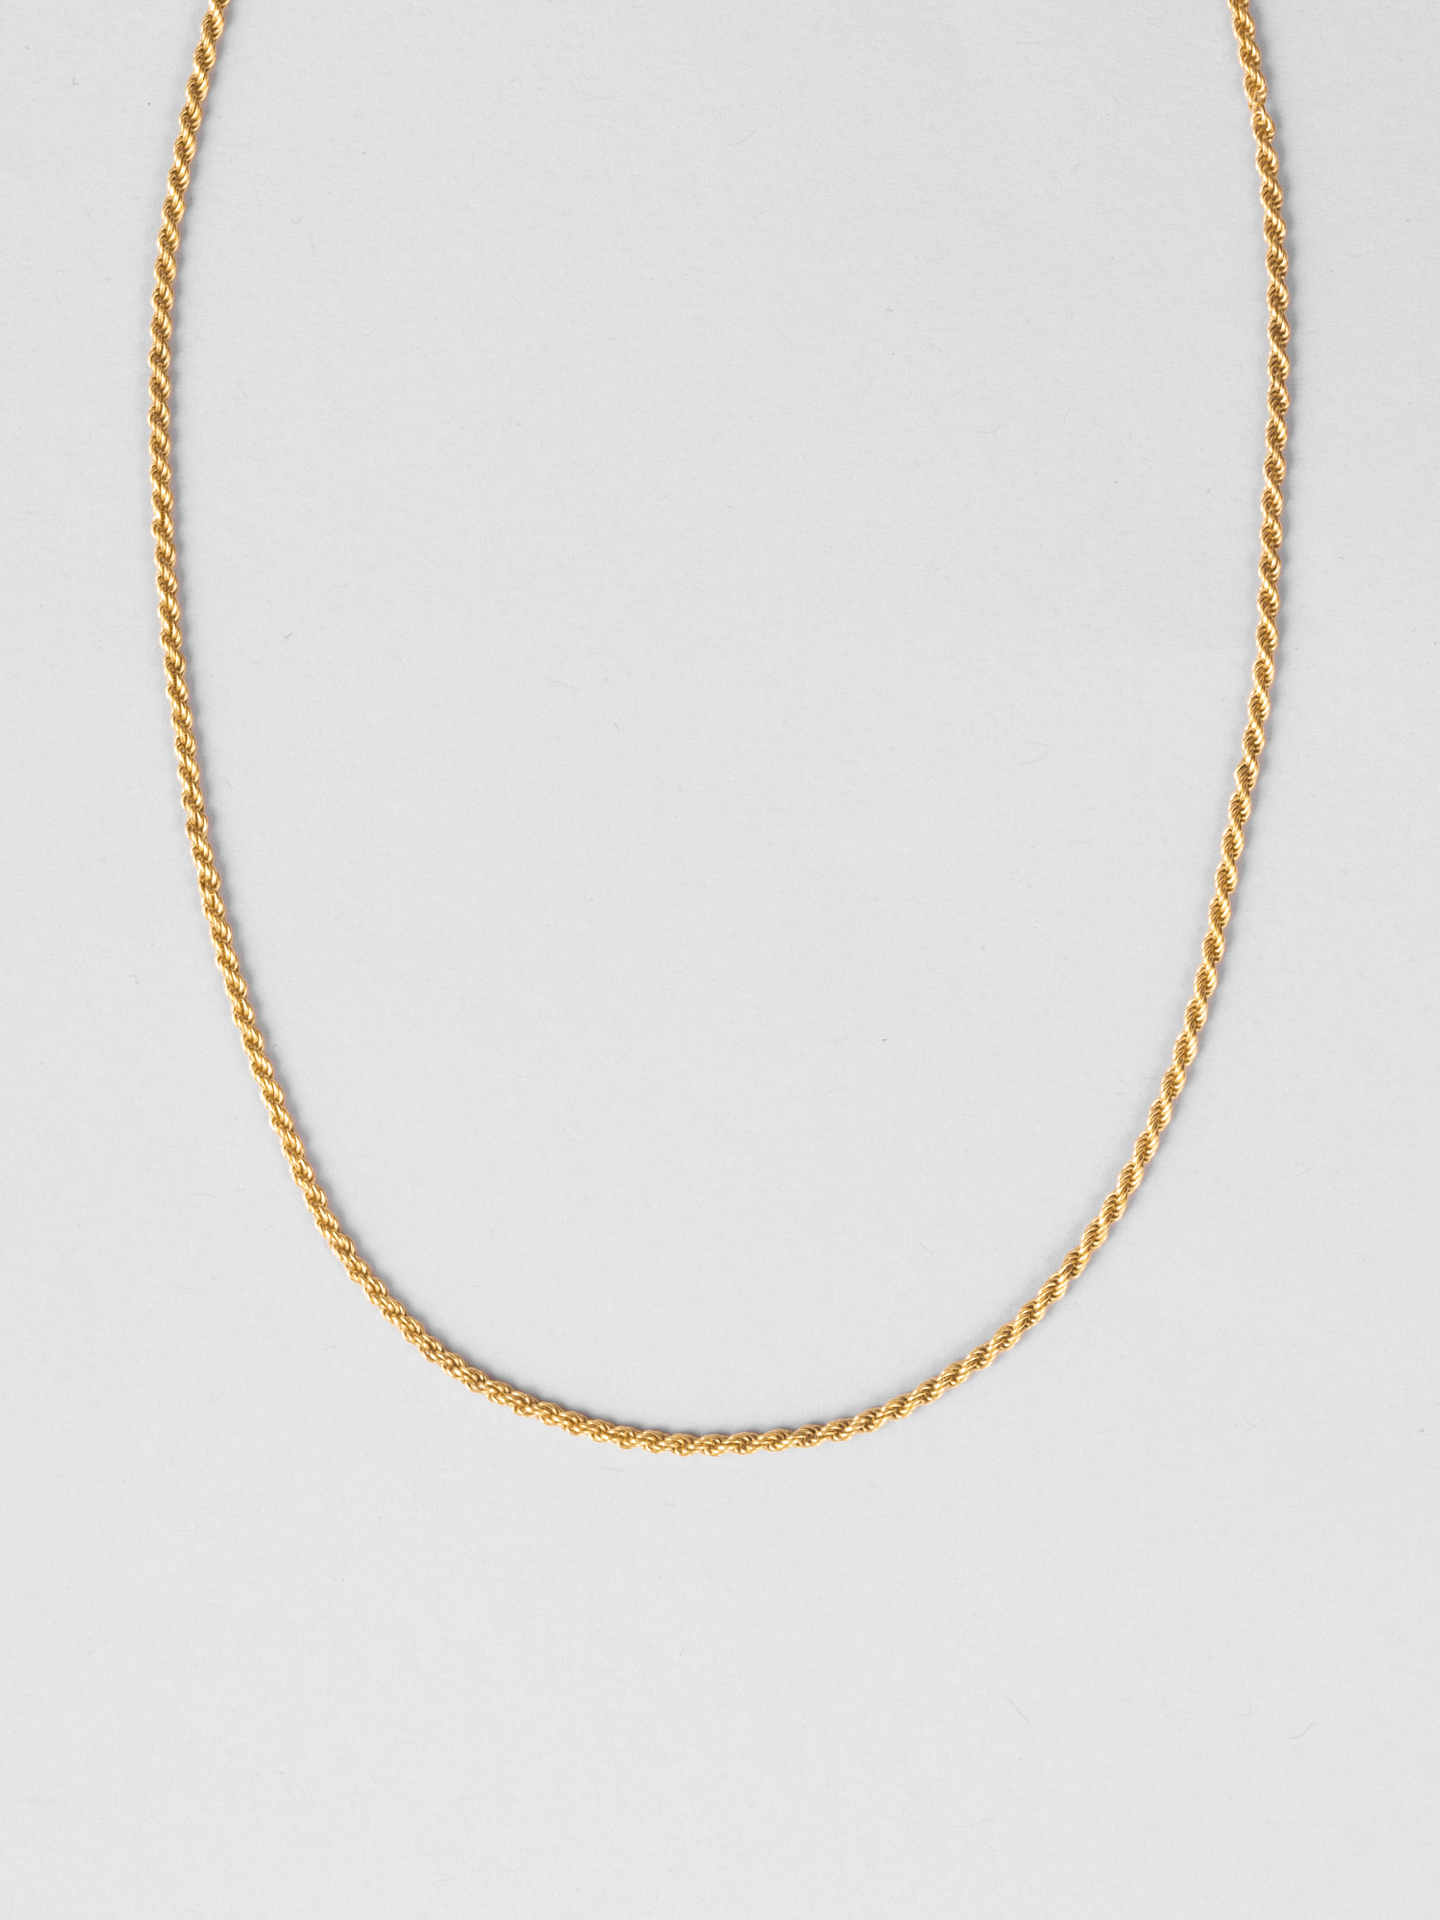 Delicate Rope Halskette